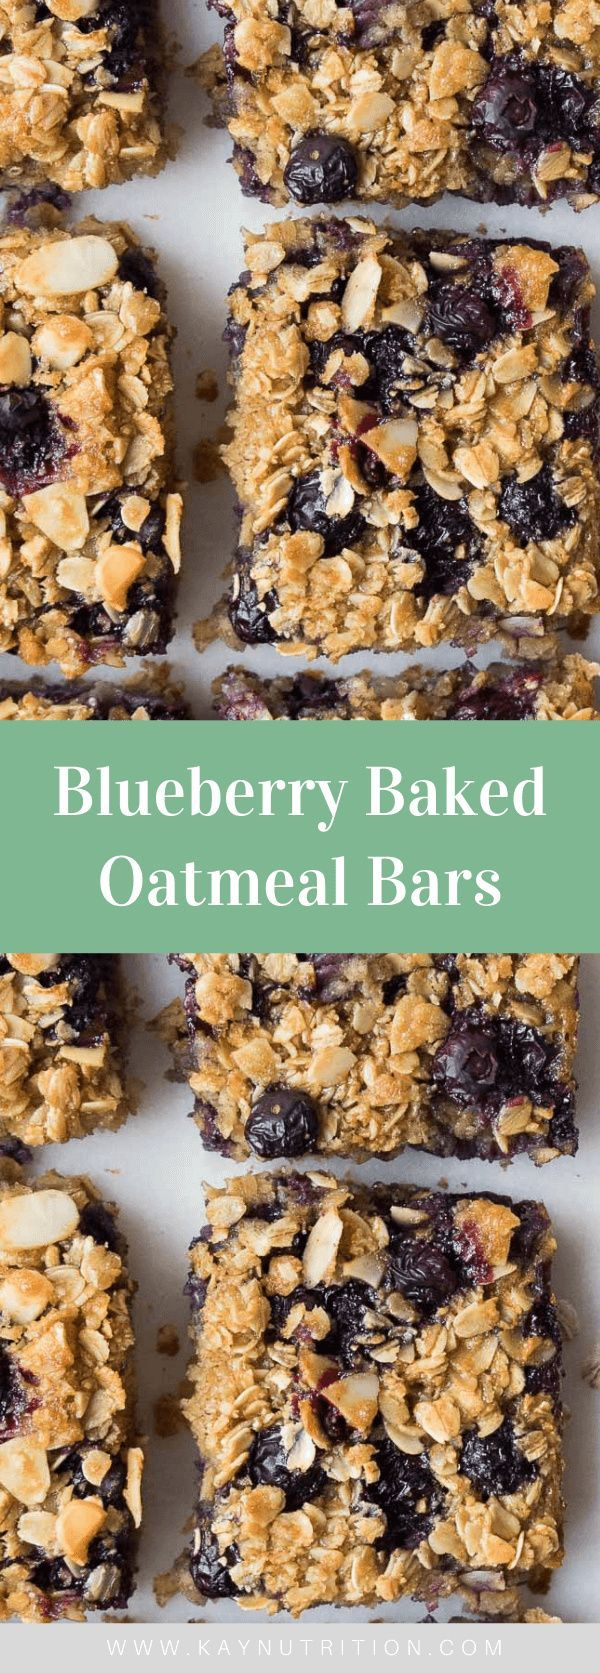 Blueberry Baked Oatmeal Bars